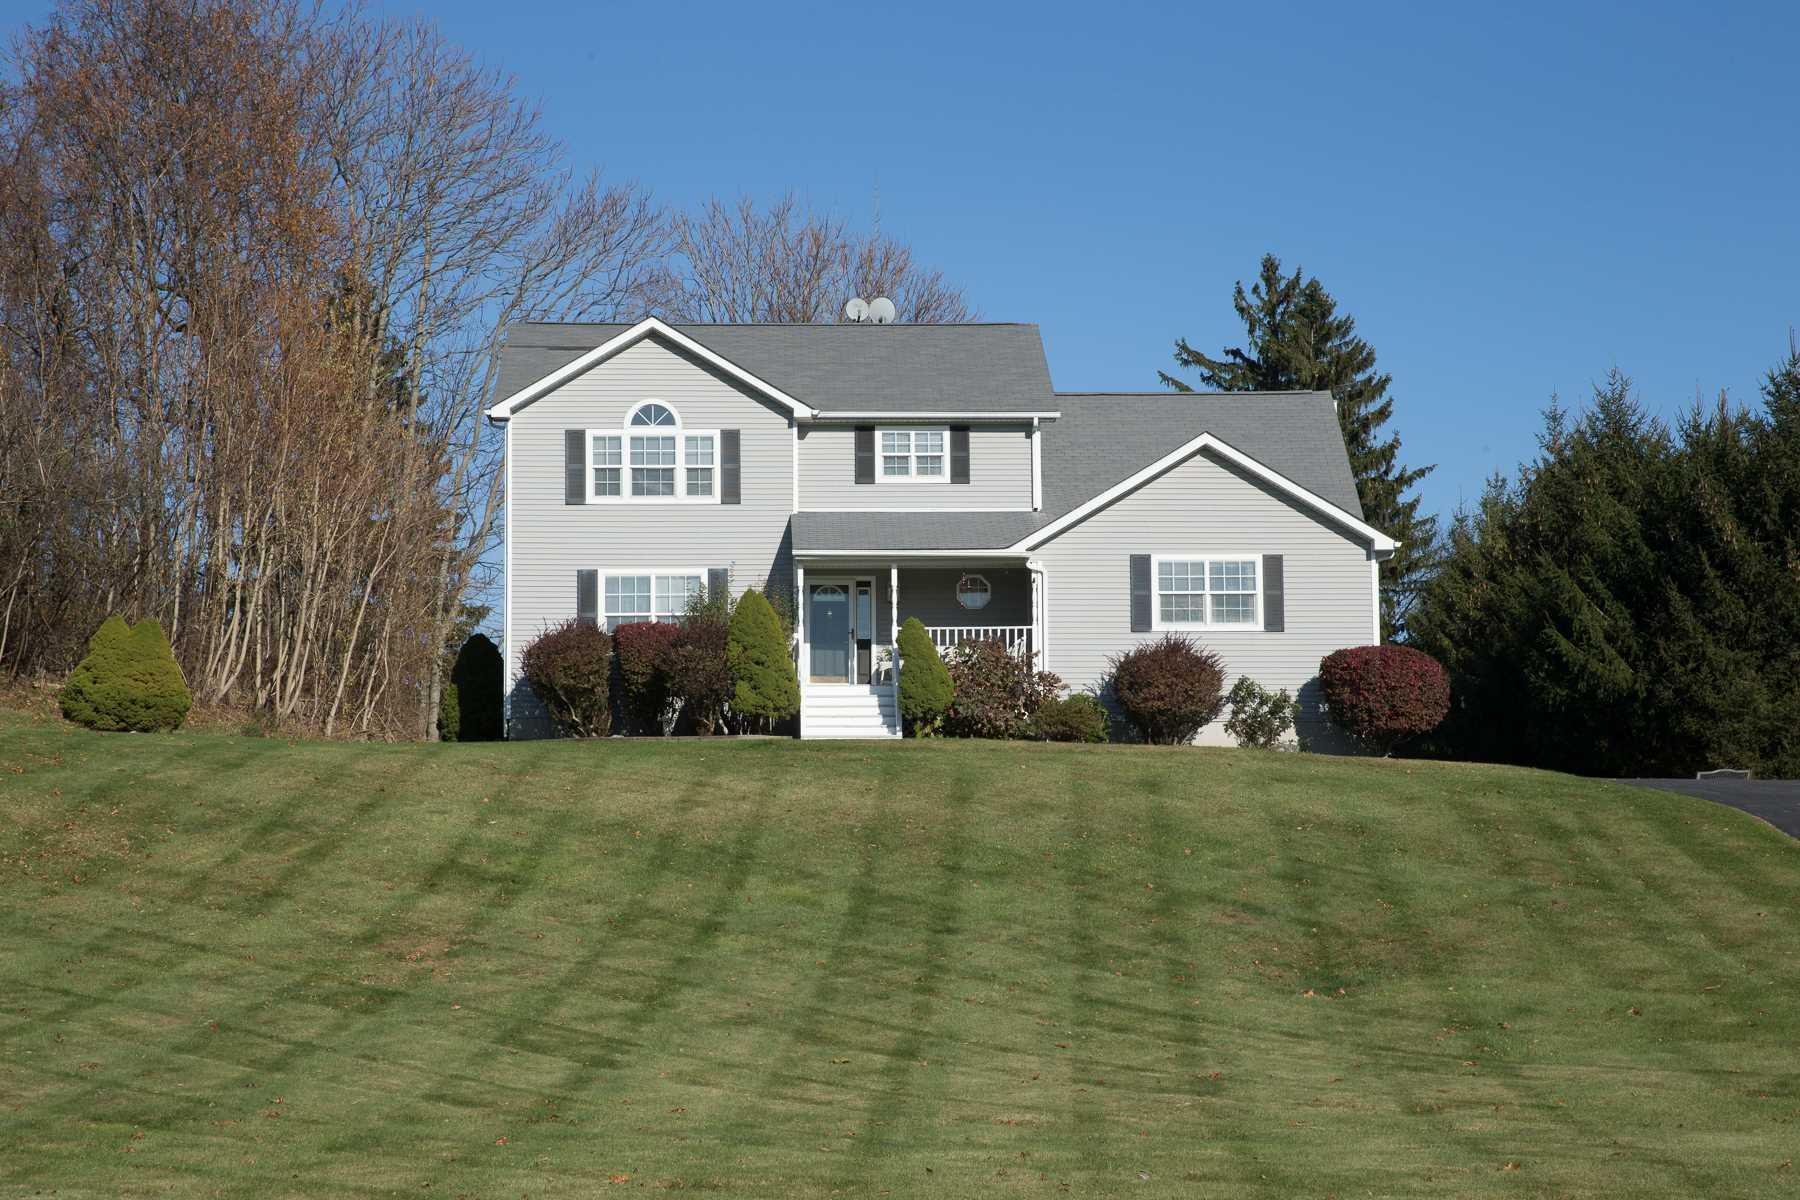 Single Family Home for Sale at 25 HONEYSUCKLE Court 25 HONEYSUCKLE Court East Fishkill, New York 12533 United States